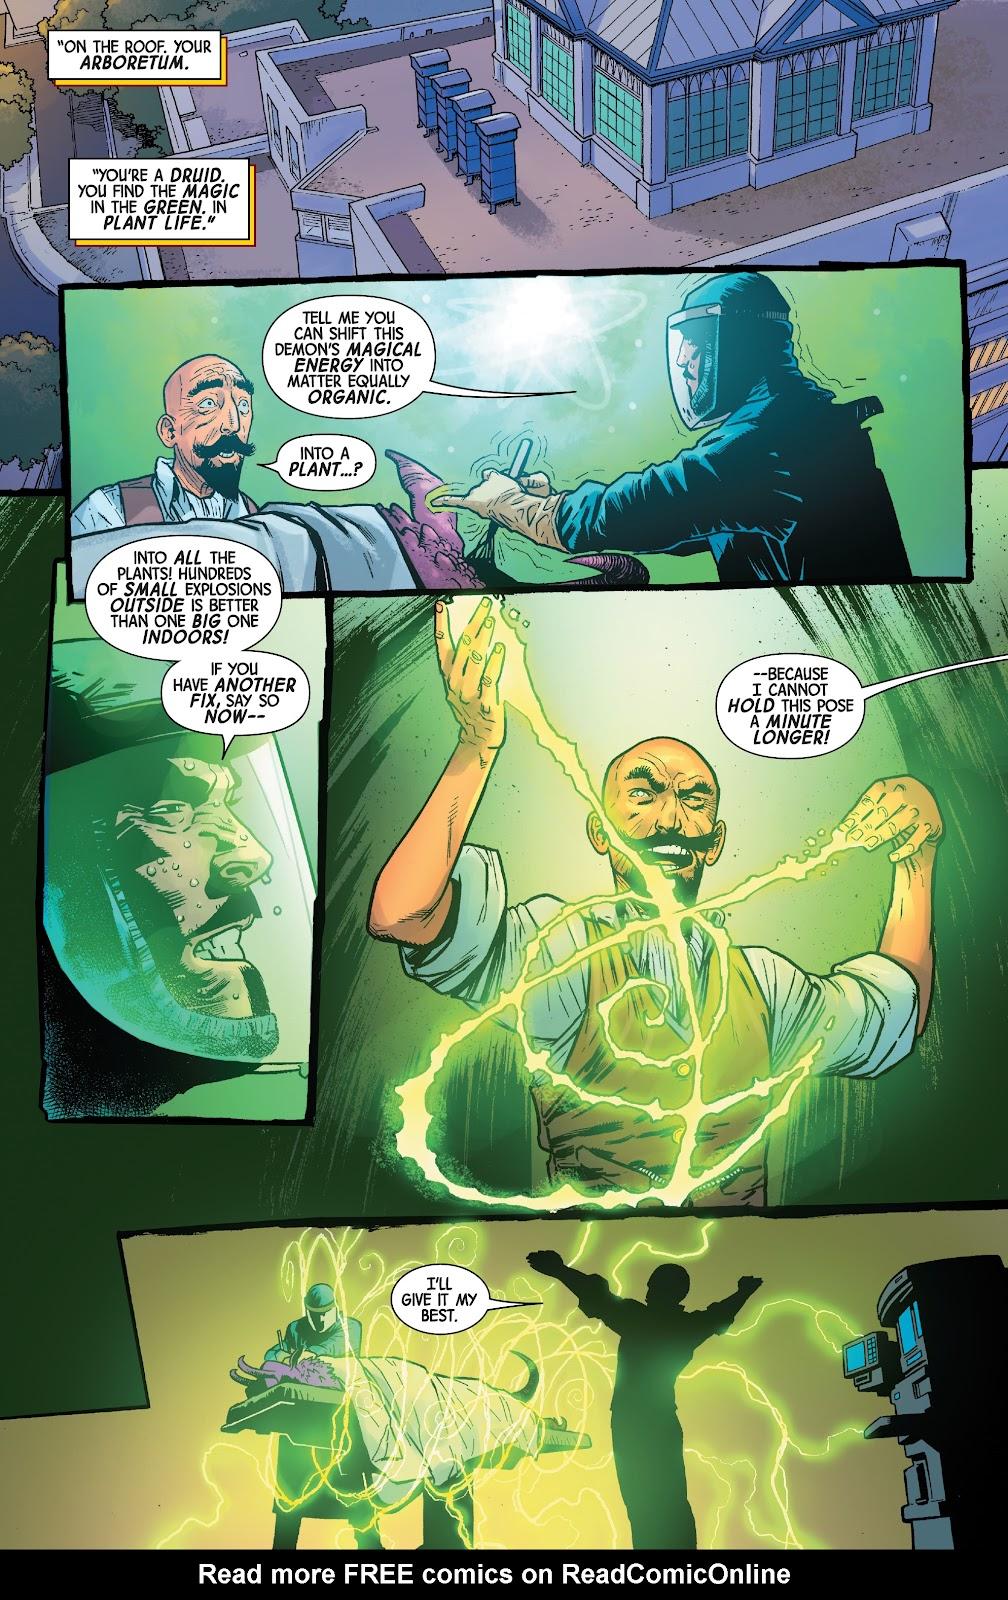 Read online Dr. Strange comic -  Issue #4 - 17